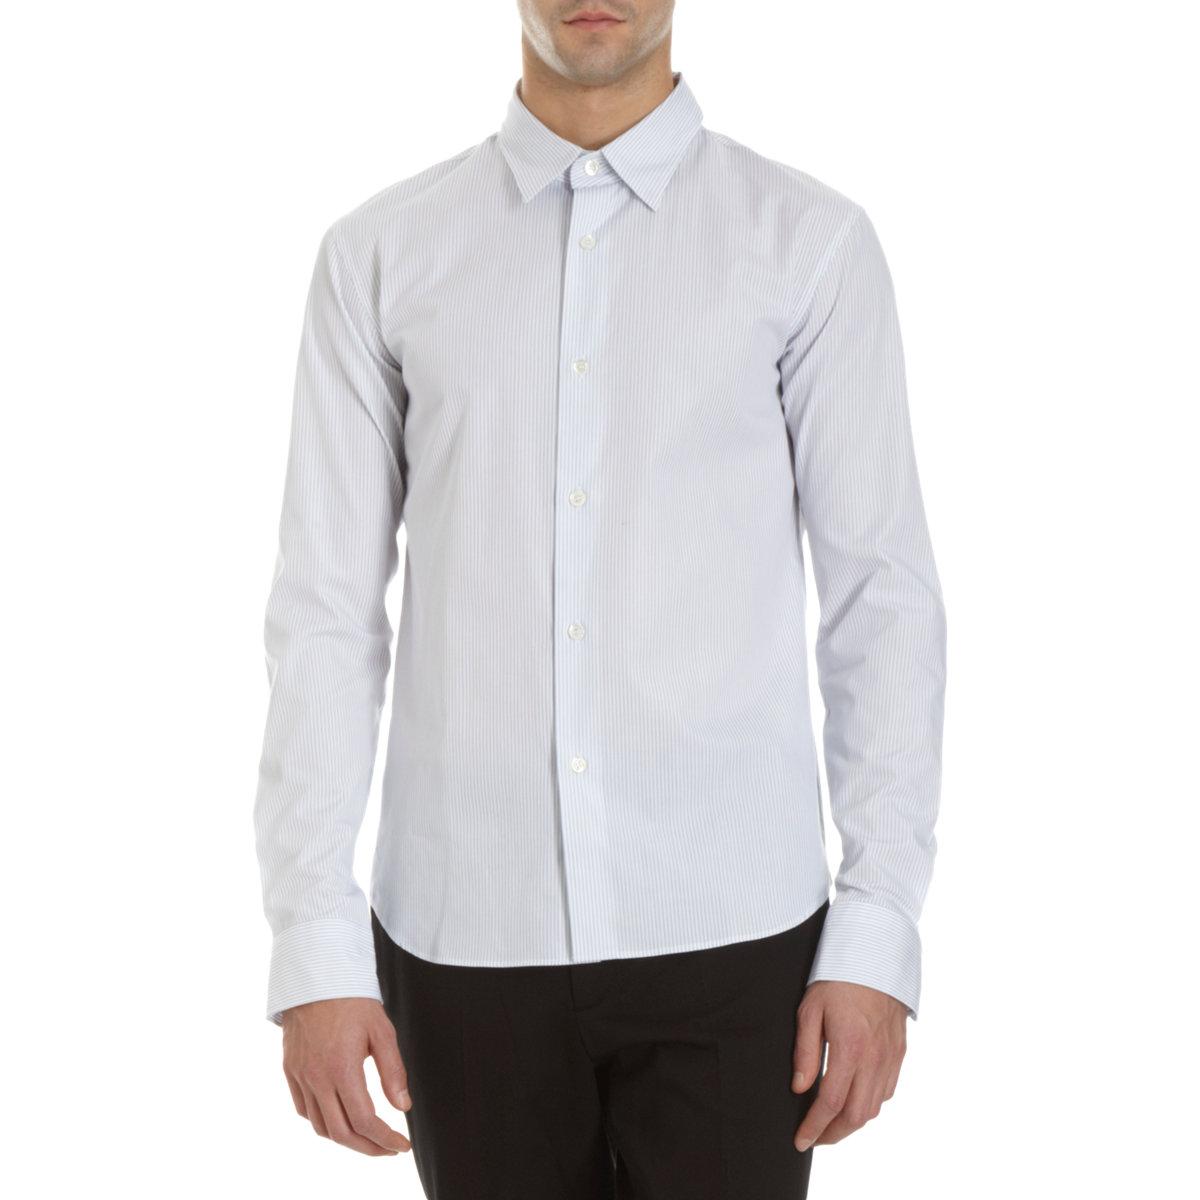 Agnes b vertical stripe dress shirt in white for men lyst for Vertical striped dress shirt